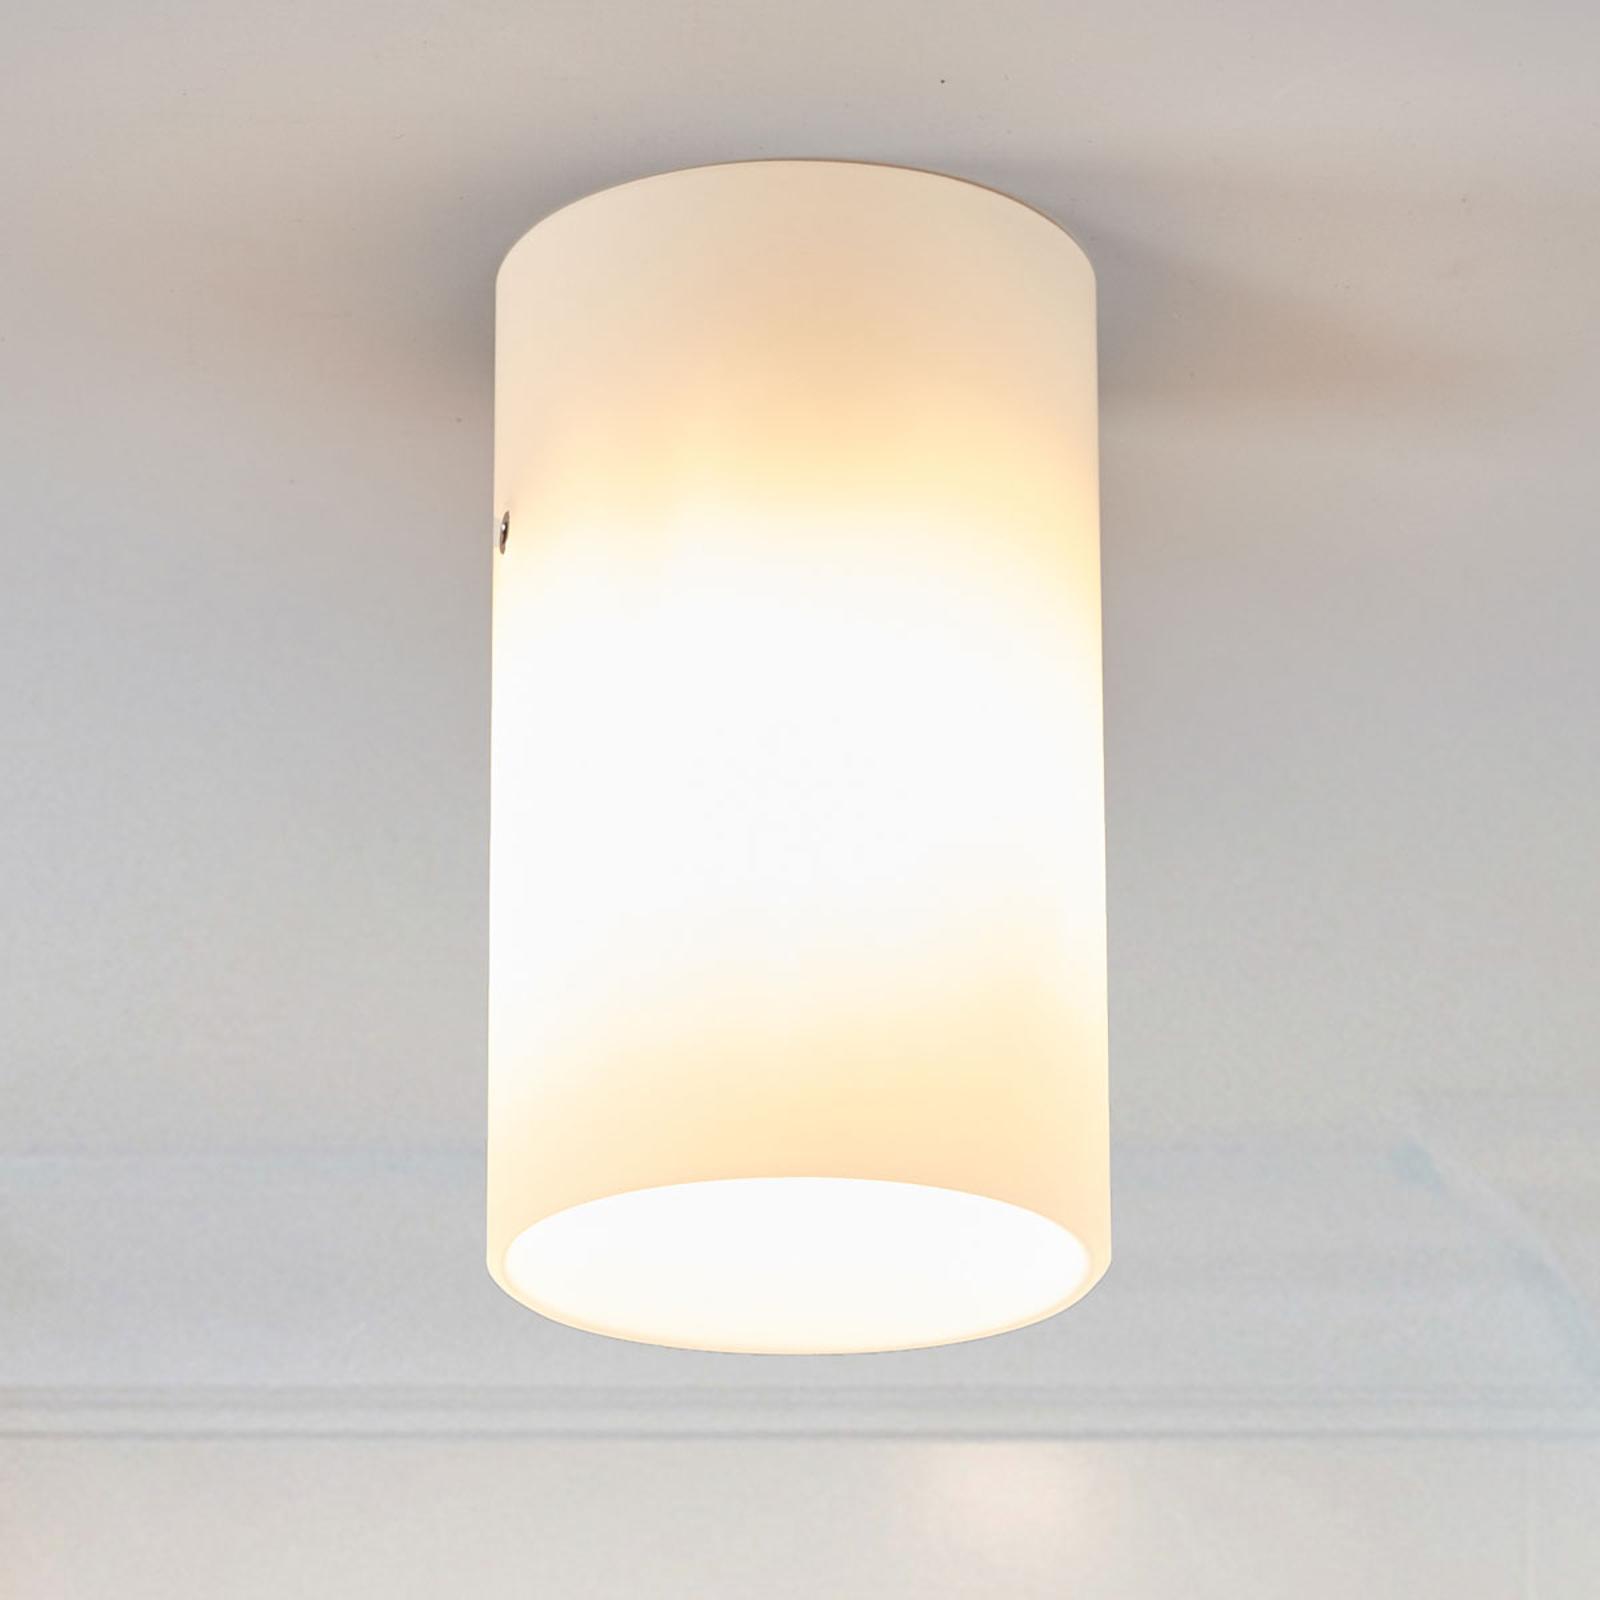 Casablanca Tube ceiling light, Ø 6 cm, G9 socket_2000068_1